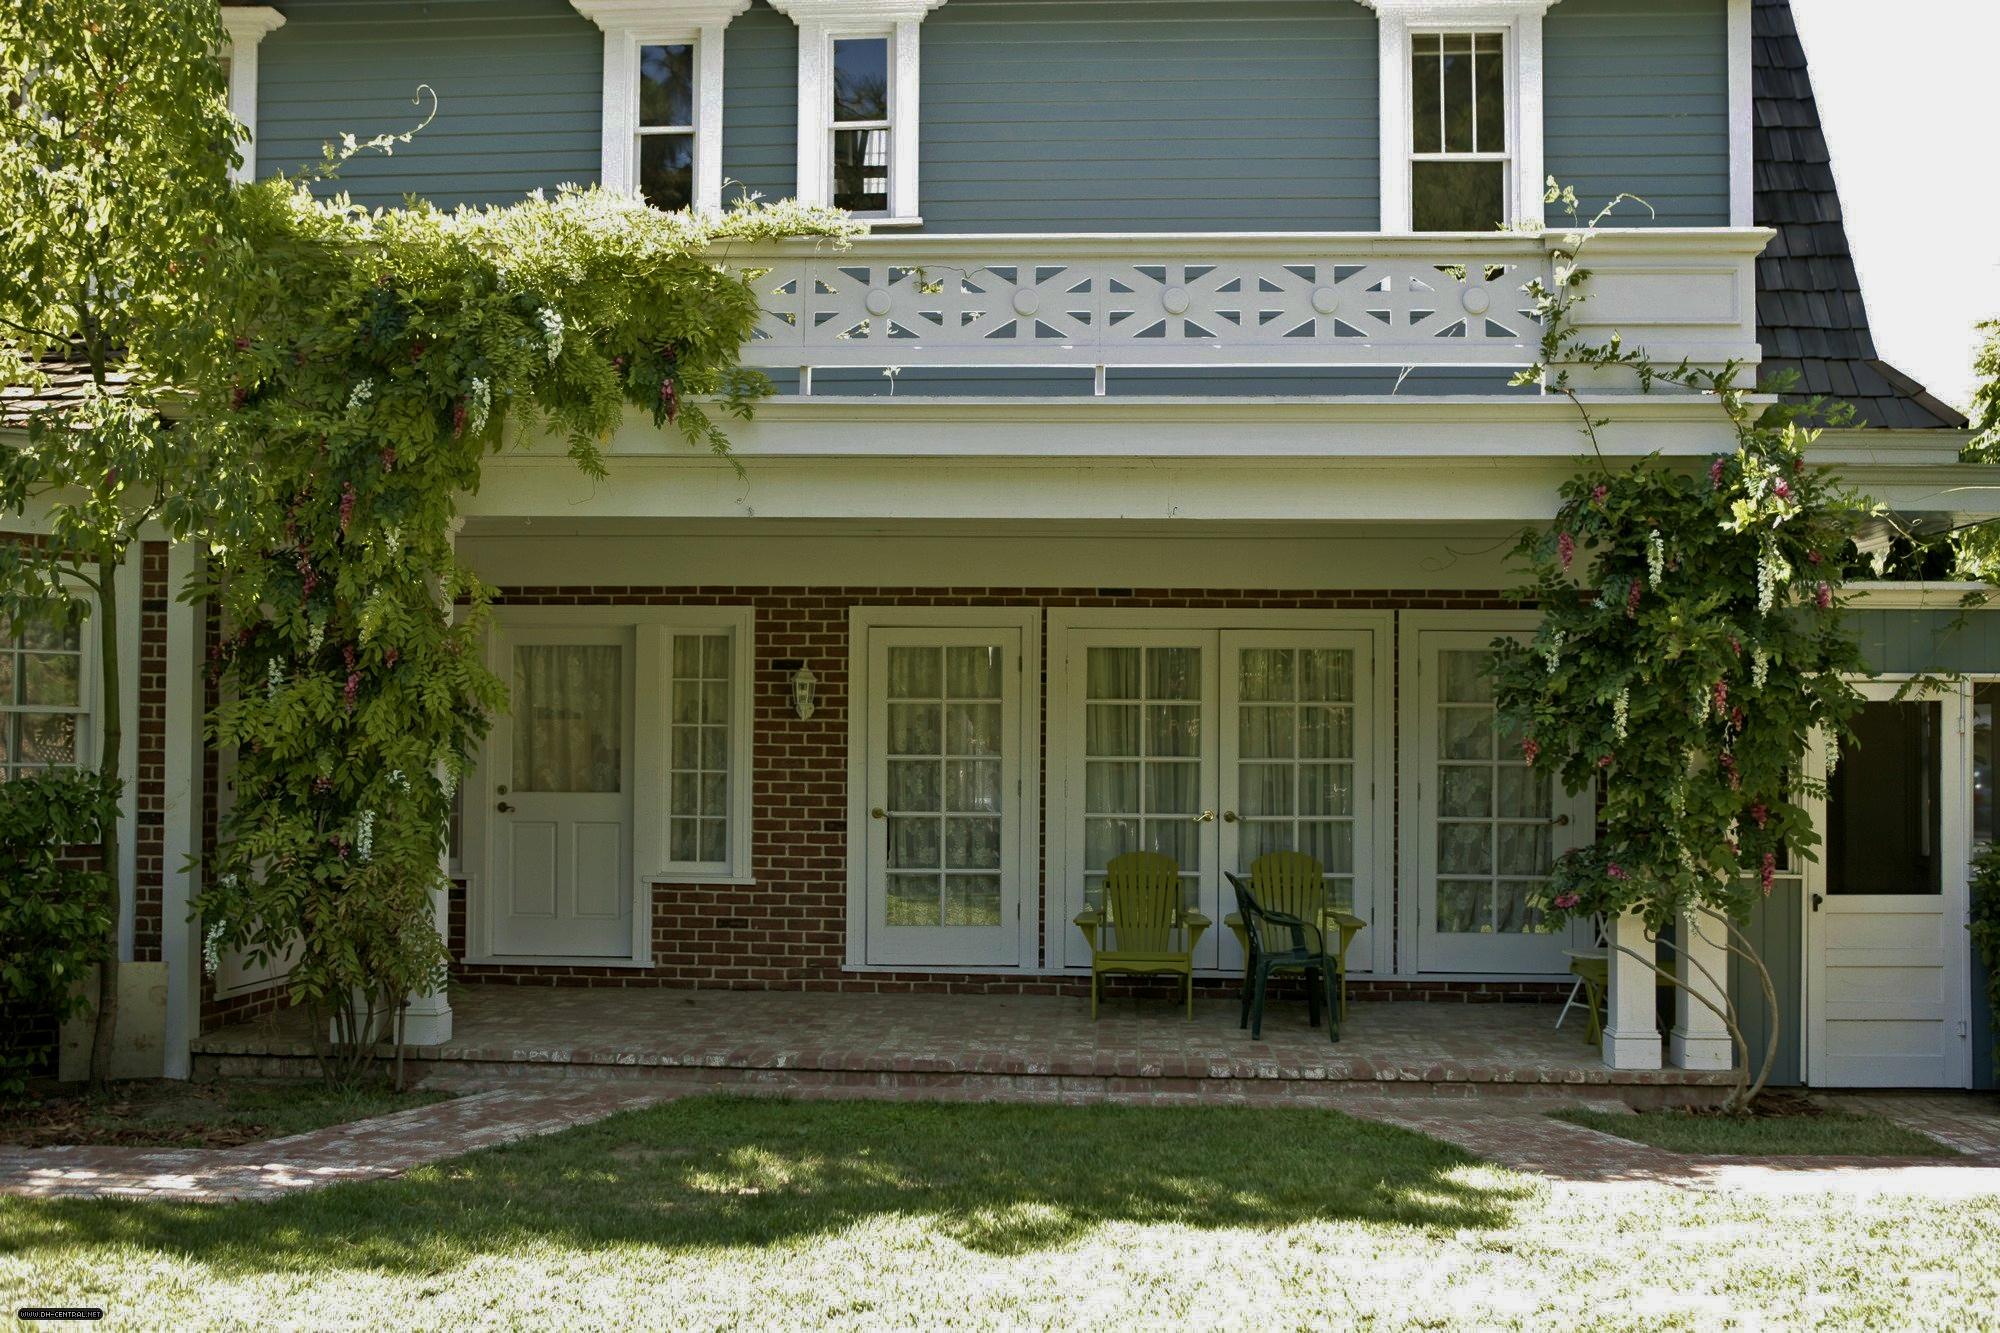 Family Van de Kamps Residence on Desperate Housewives – Bree Van De Kamp House Floor Plan